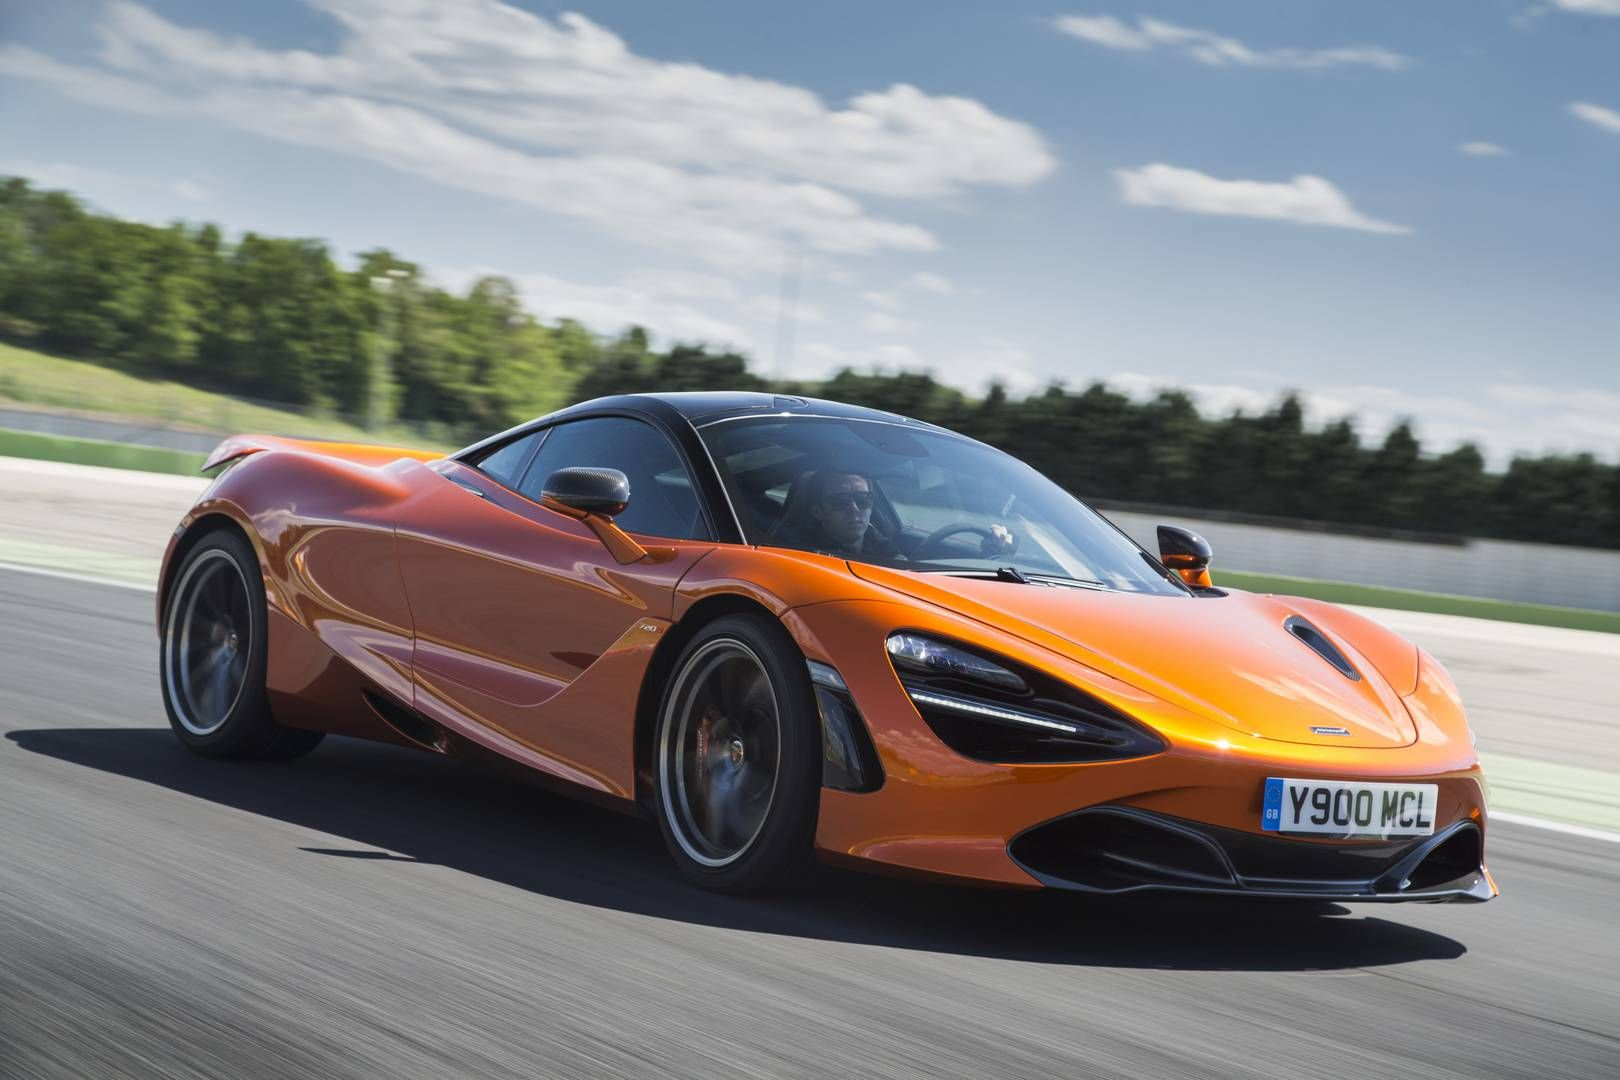 Mclaren 720s Review Best Car Insurance Best Auto Insurance